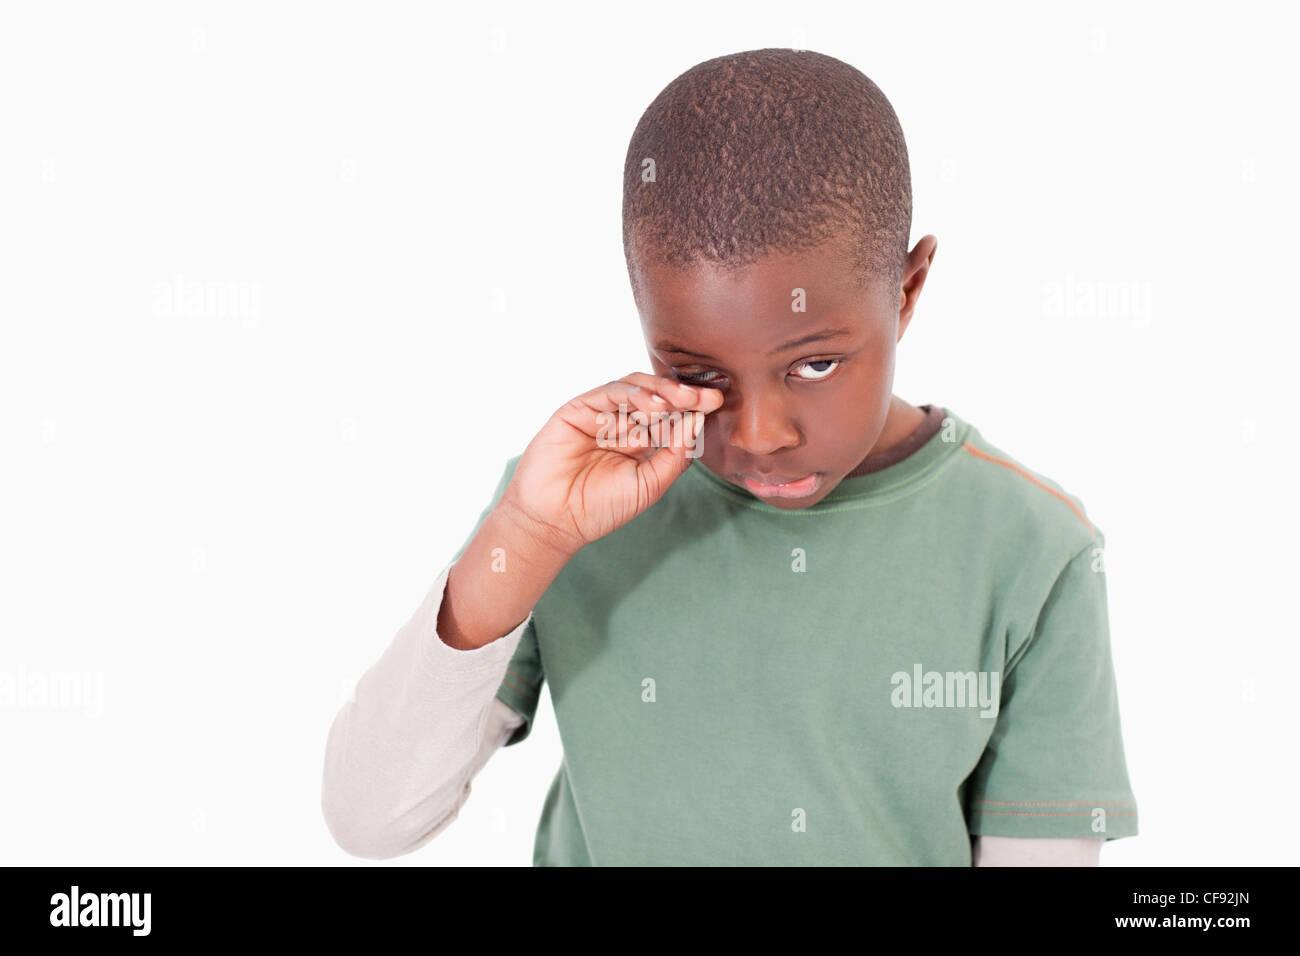 Little boy crying - Stock Image